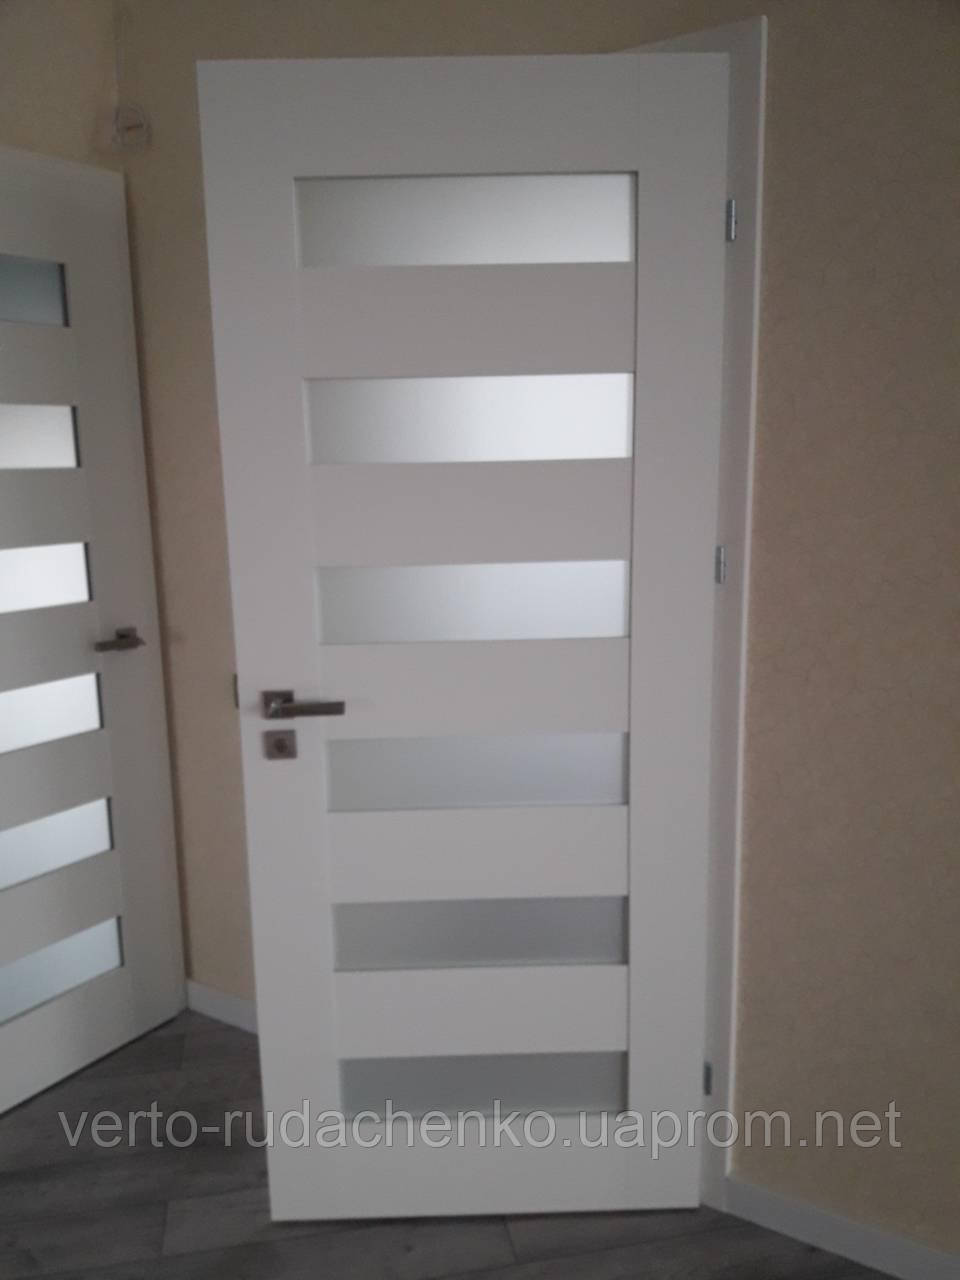 Двери Verto Полло 3.6 цвет Белый «Резист»